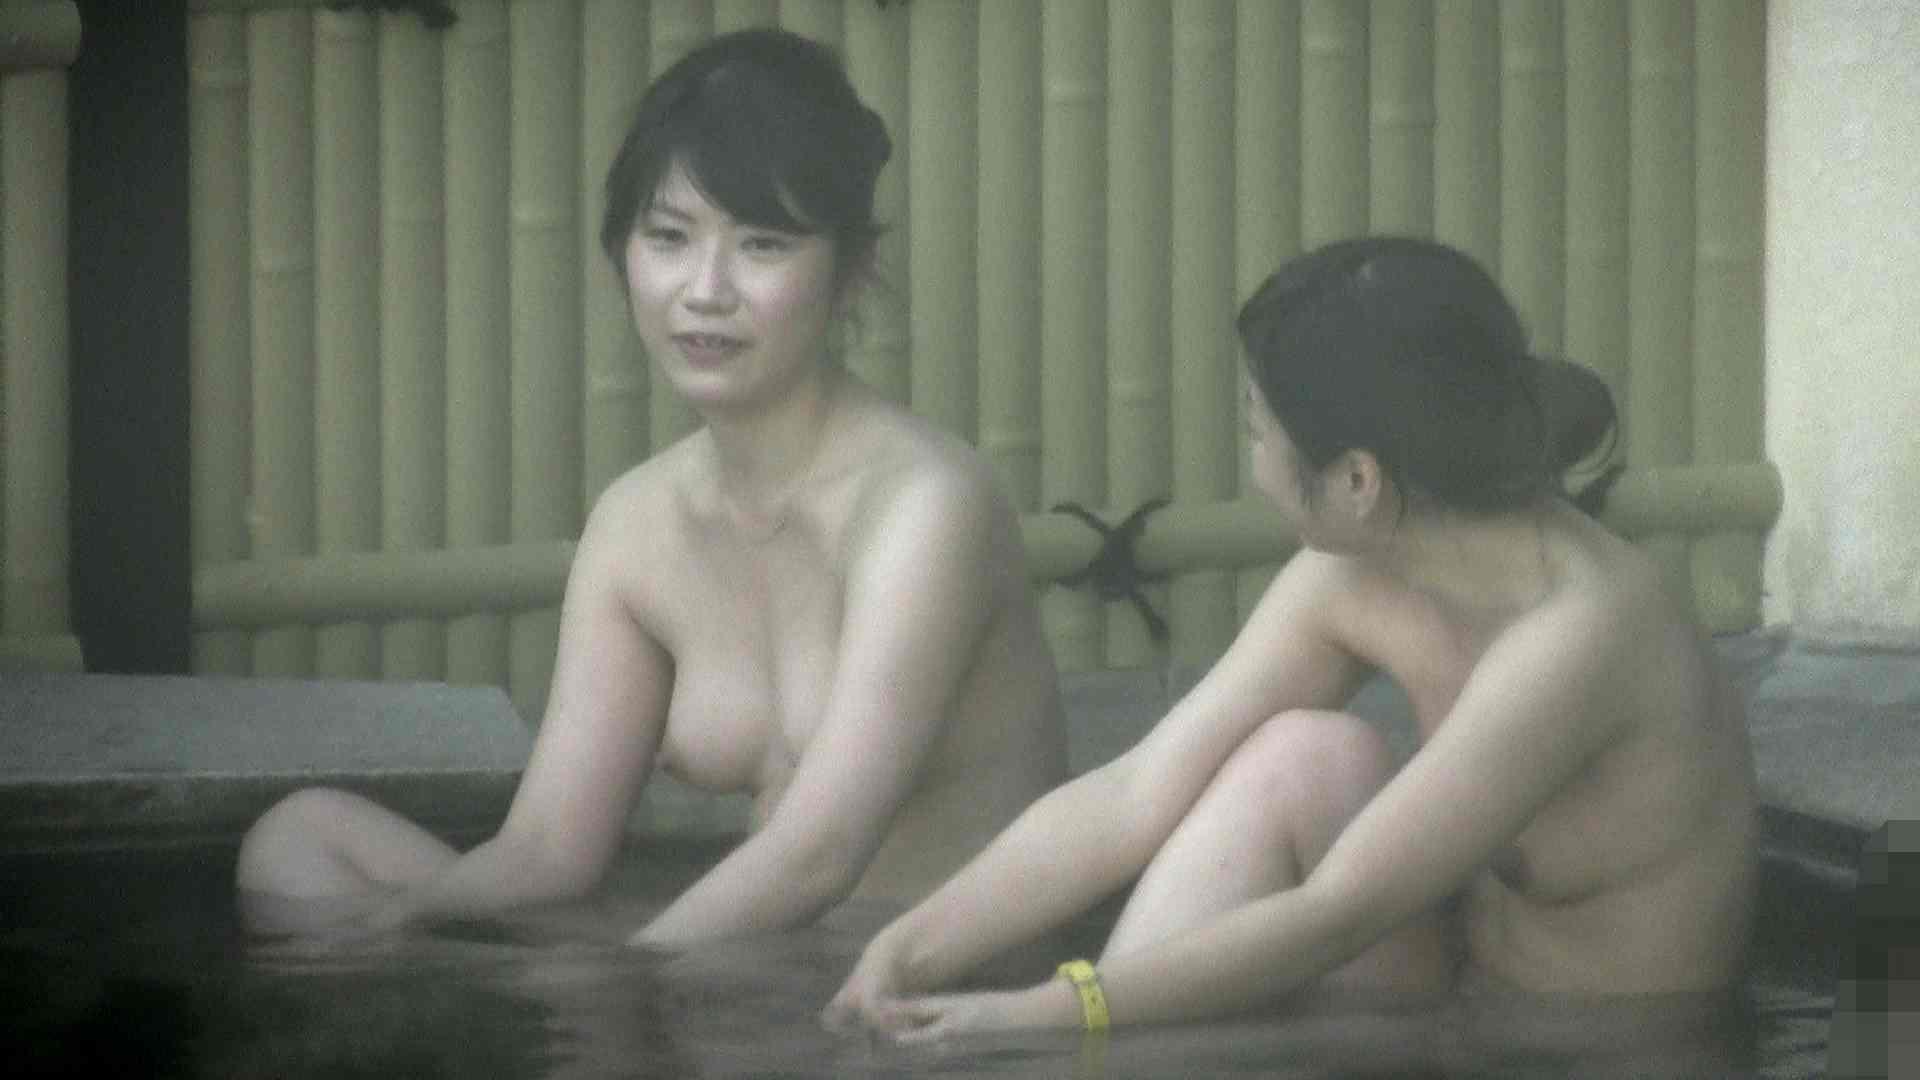 Aquaな露天風呂Vol.206 OL女体 オマンコ動画キャプチャ 80連発 80